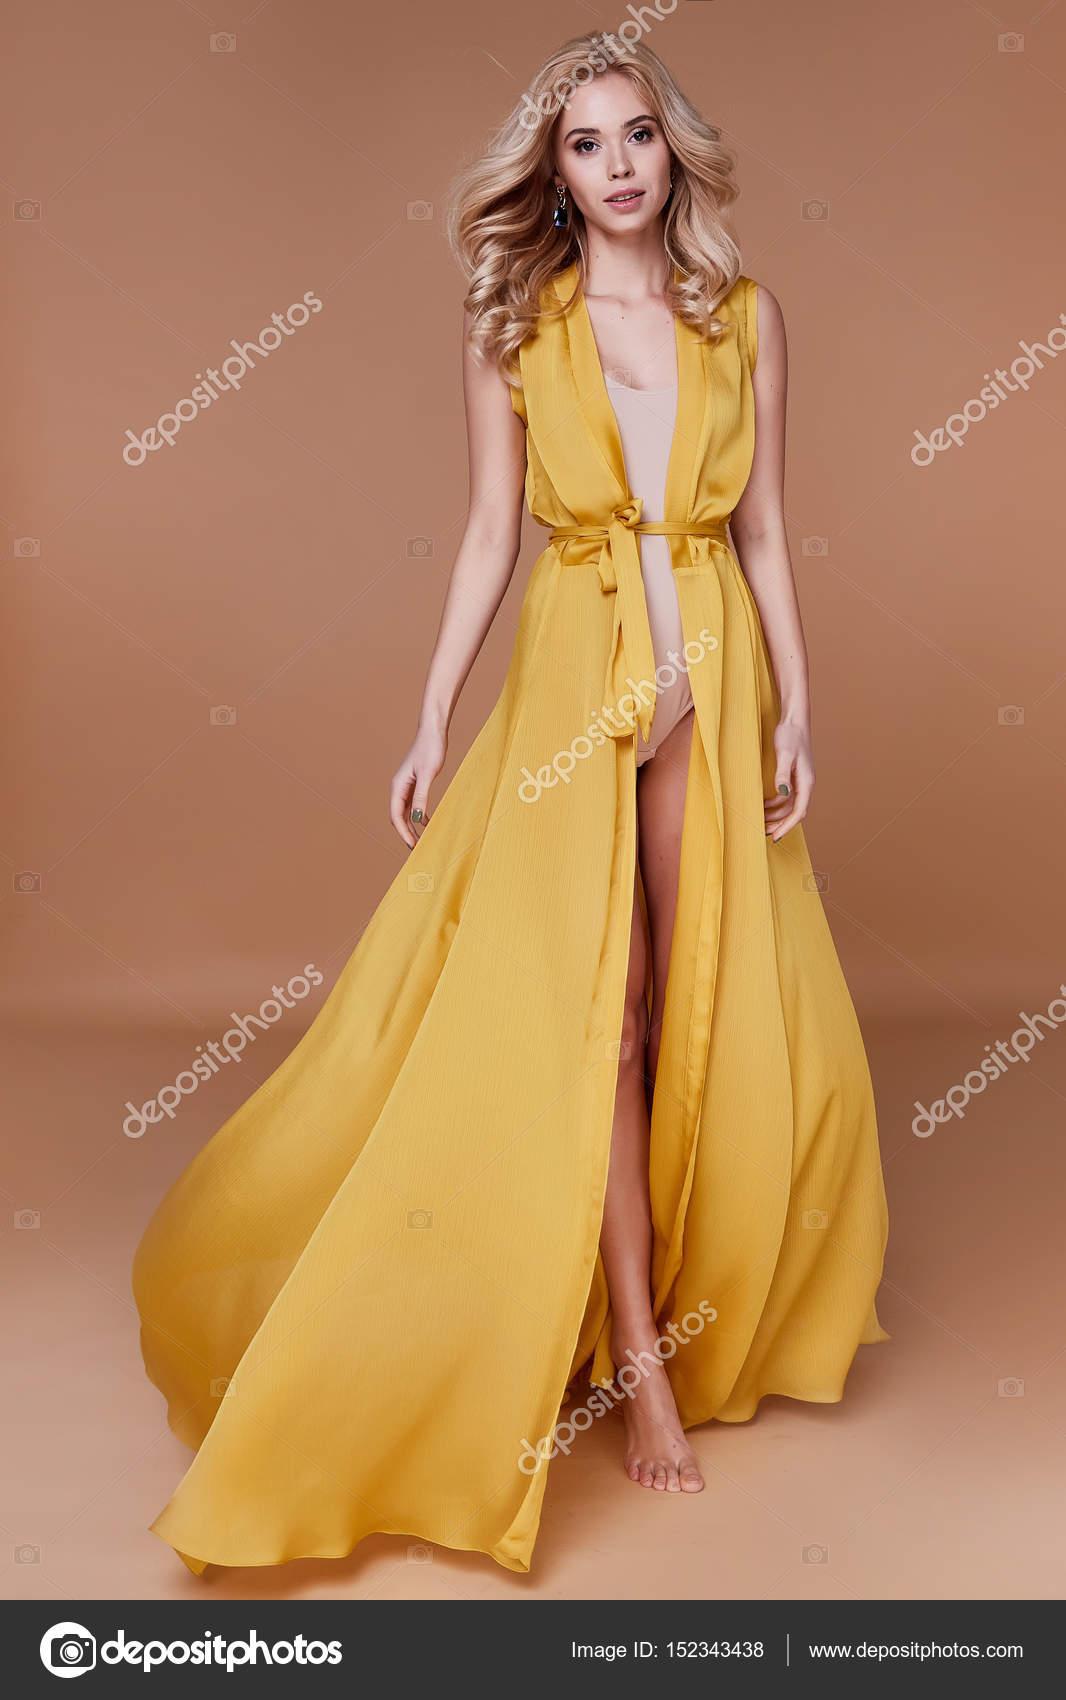 50cc0a8ea212 Ξανθά μαλλιά γυναίκα όμορφη πρόσωπο σέξι κοκαλιάρικο σώμα μαύρισμα δέρμα  φροντίδα φορούν μόδας φόρεμα μεταξιού κίτρινο χρώμα διάδρομο μοντέλο studio  στον ...